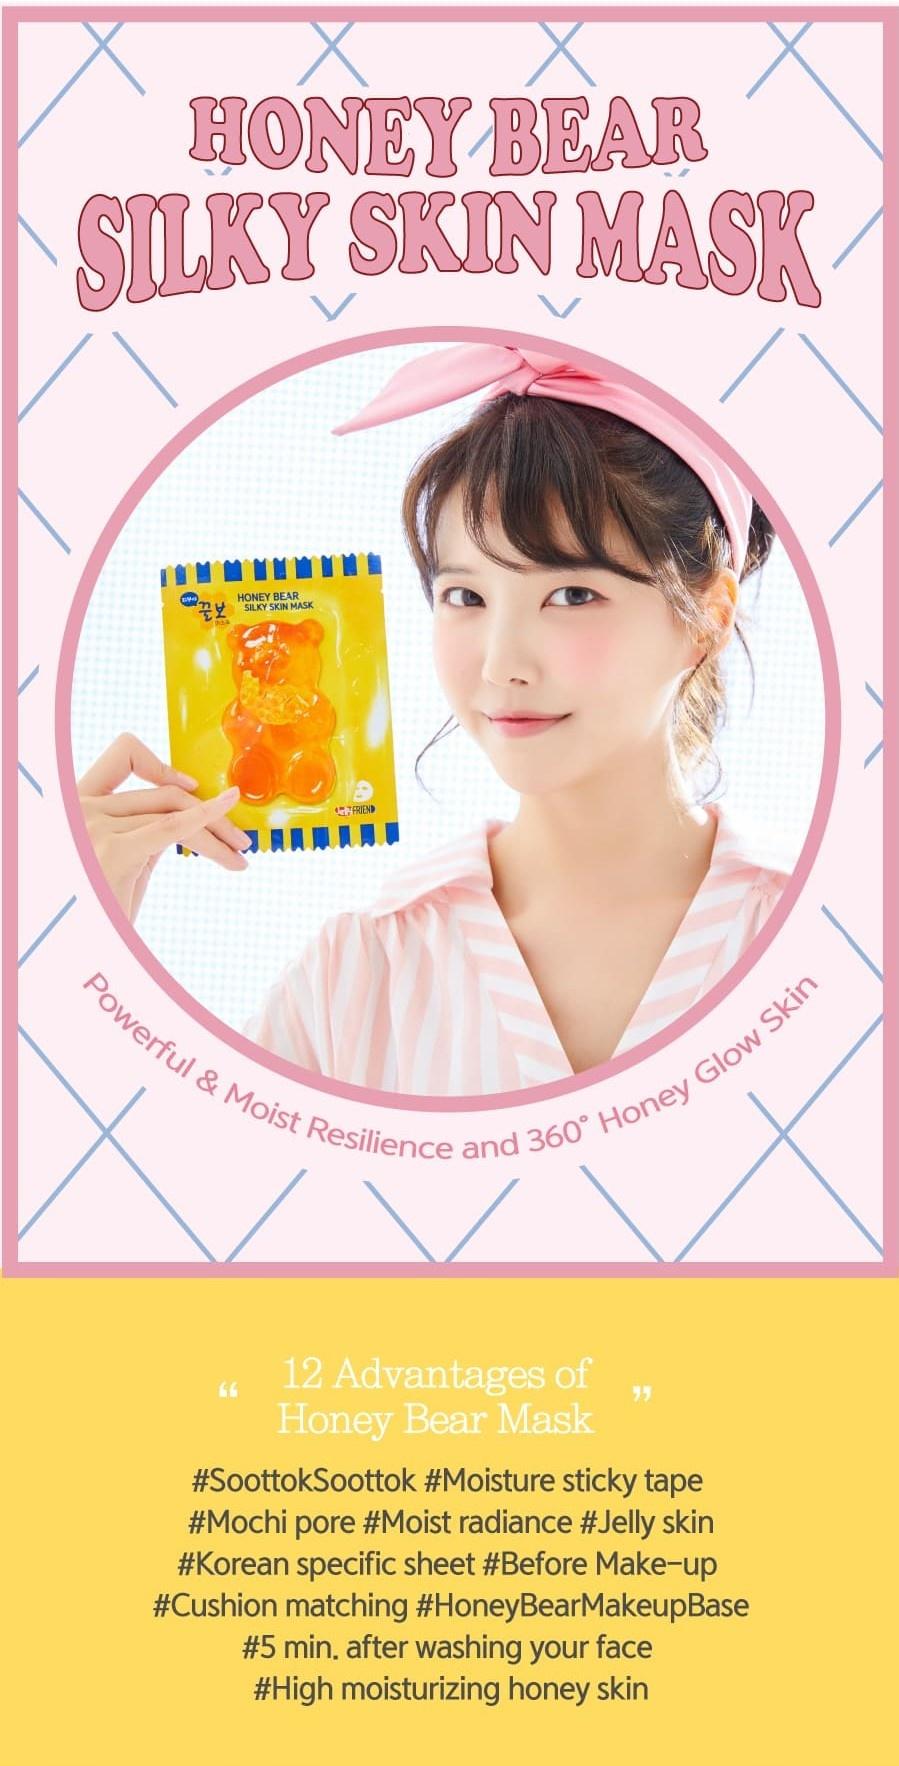 Honey Bear Silky Skin Mask-7